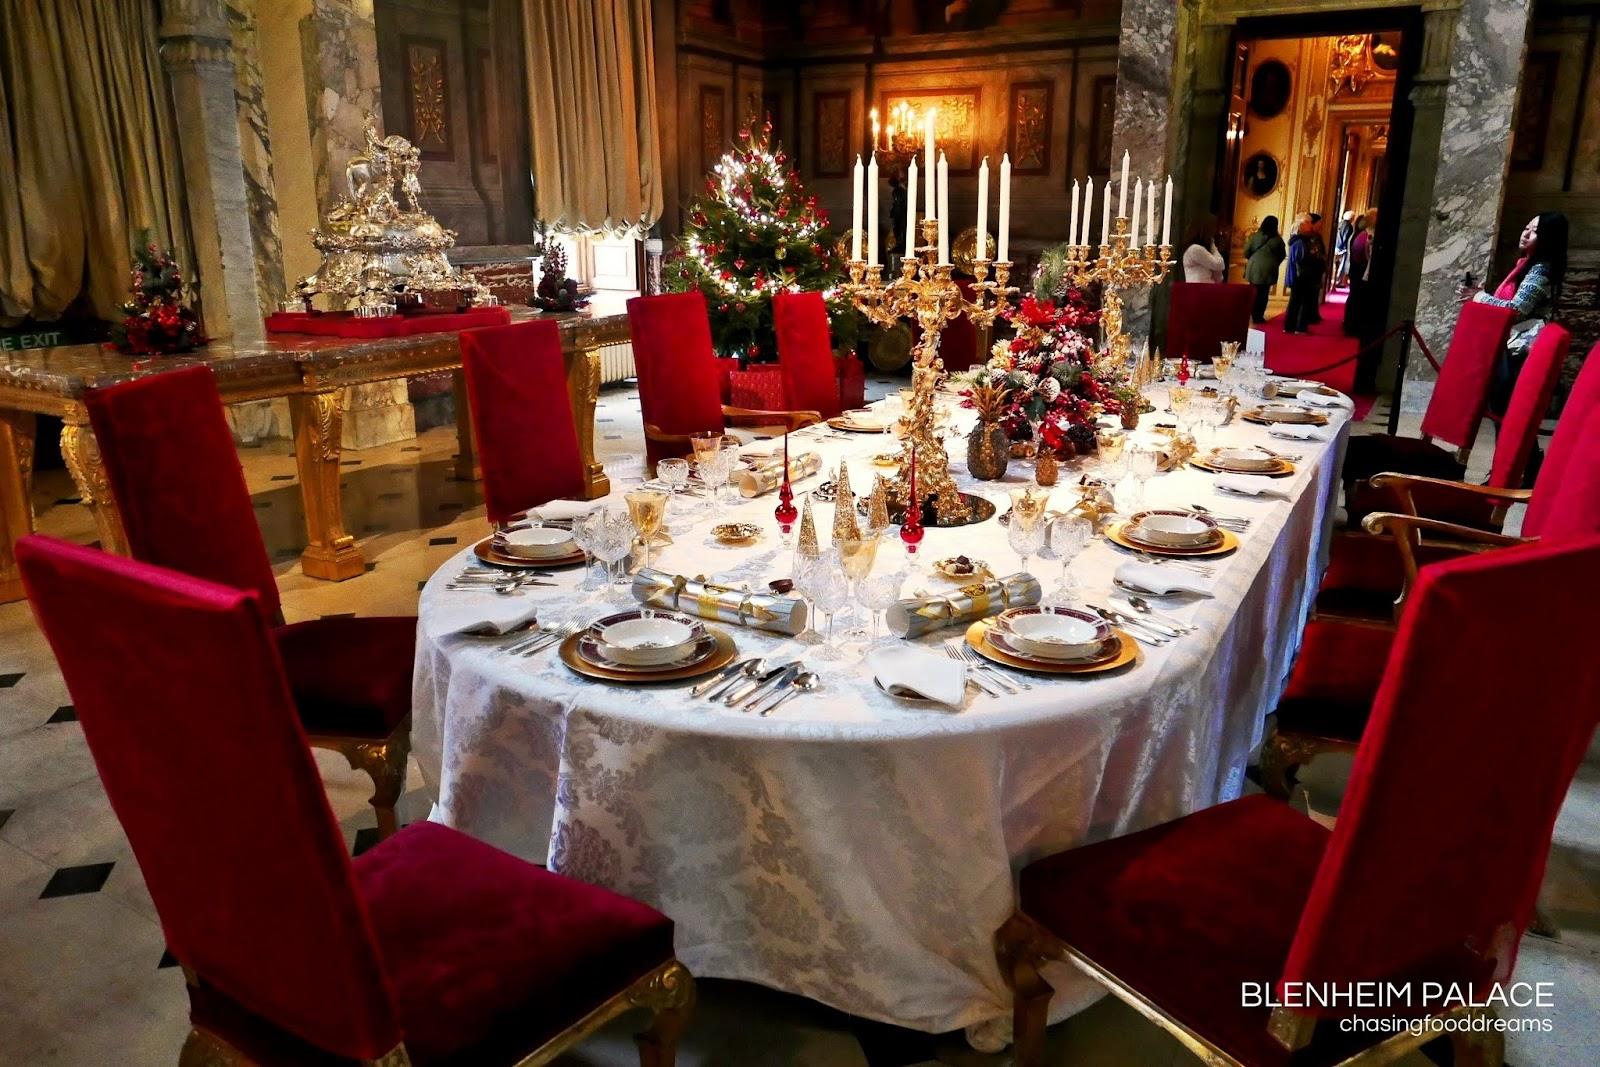 Blenheim Palace Food Festival